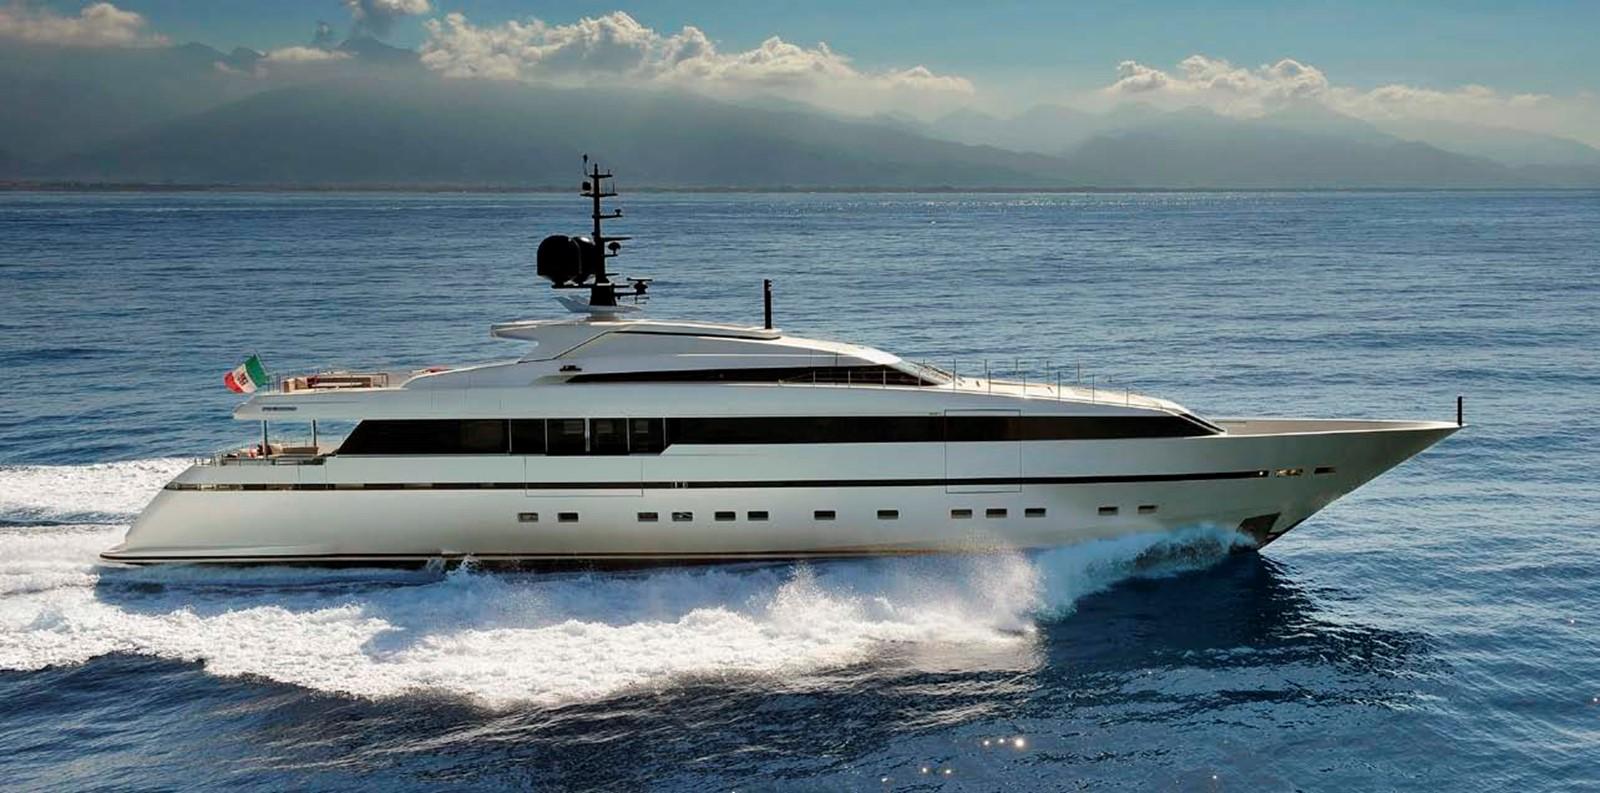 2013 SANLORENZO 40ALLOY Motor Yacht 1356919